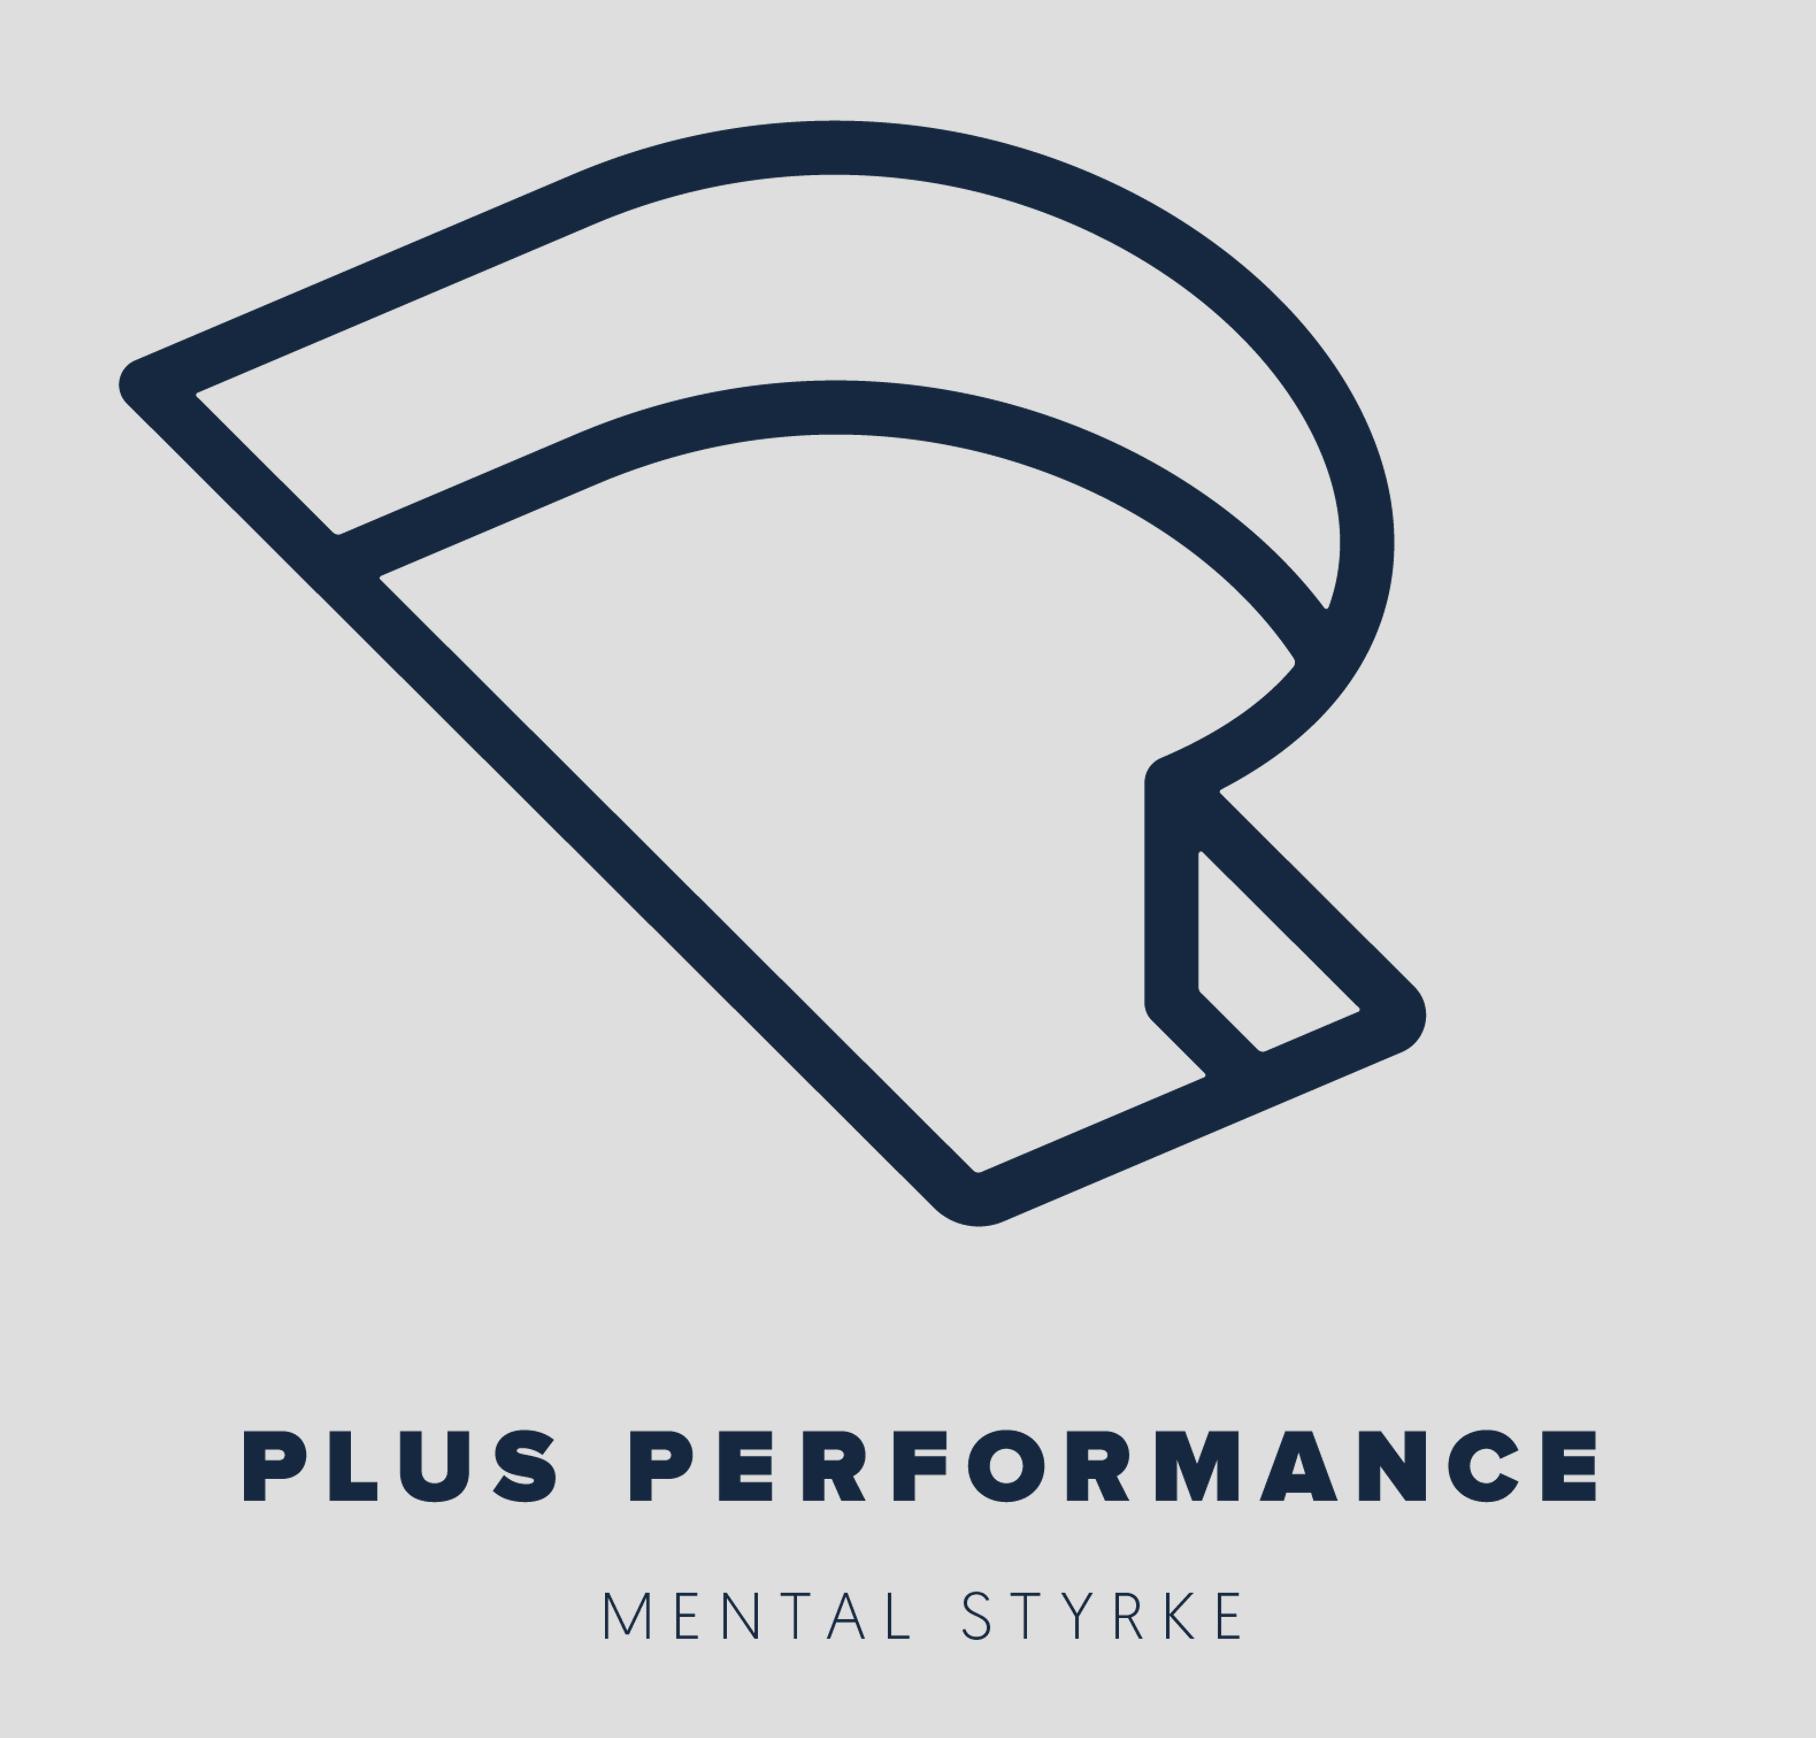 Plus Performance